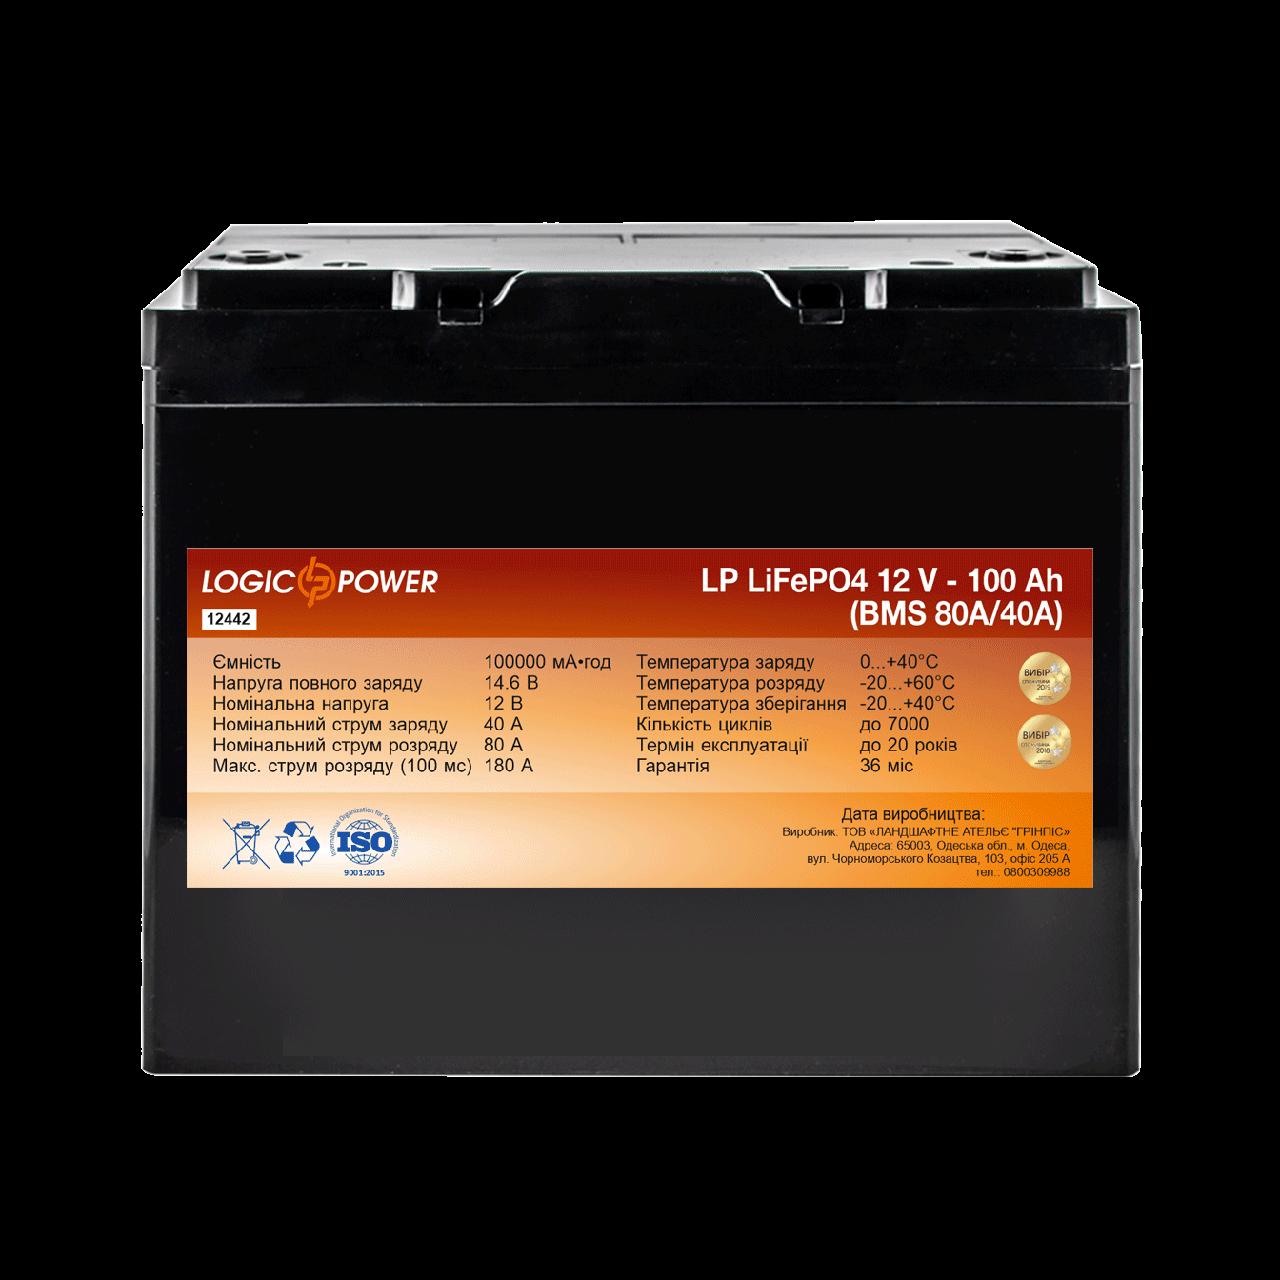 Акумулятор LP LiFePO4 12 V - 100 Ah (BMS 80A/40А) пластик